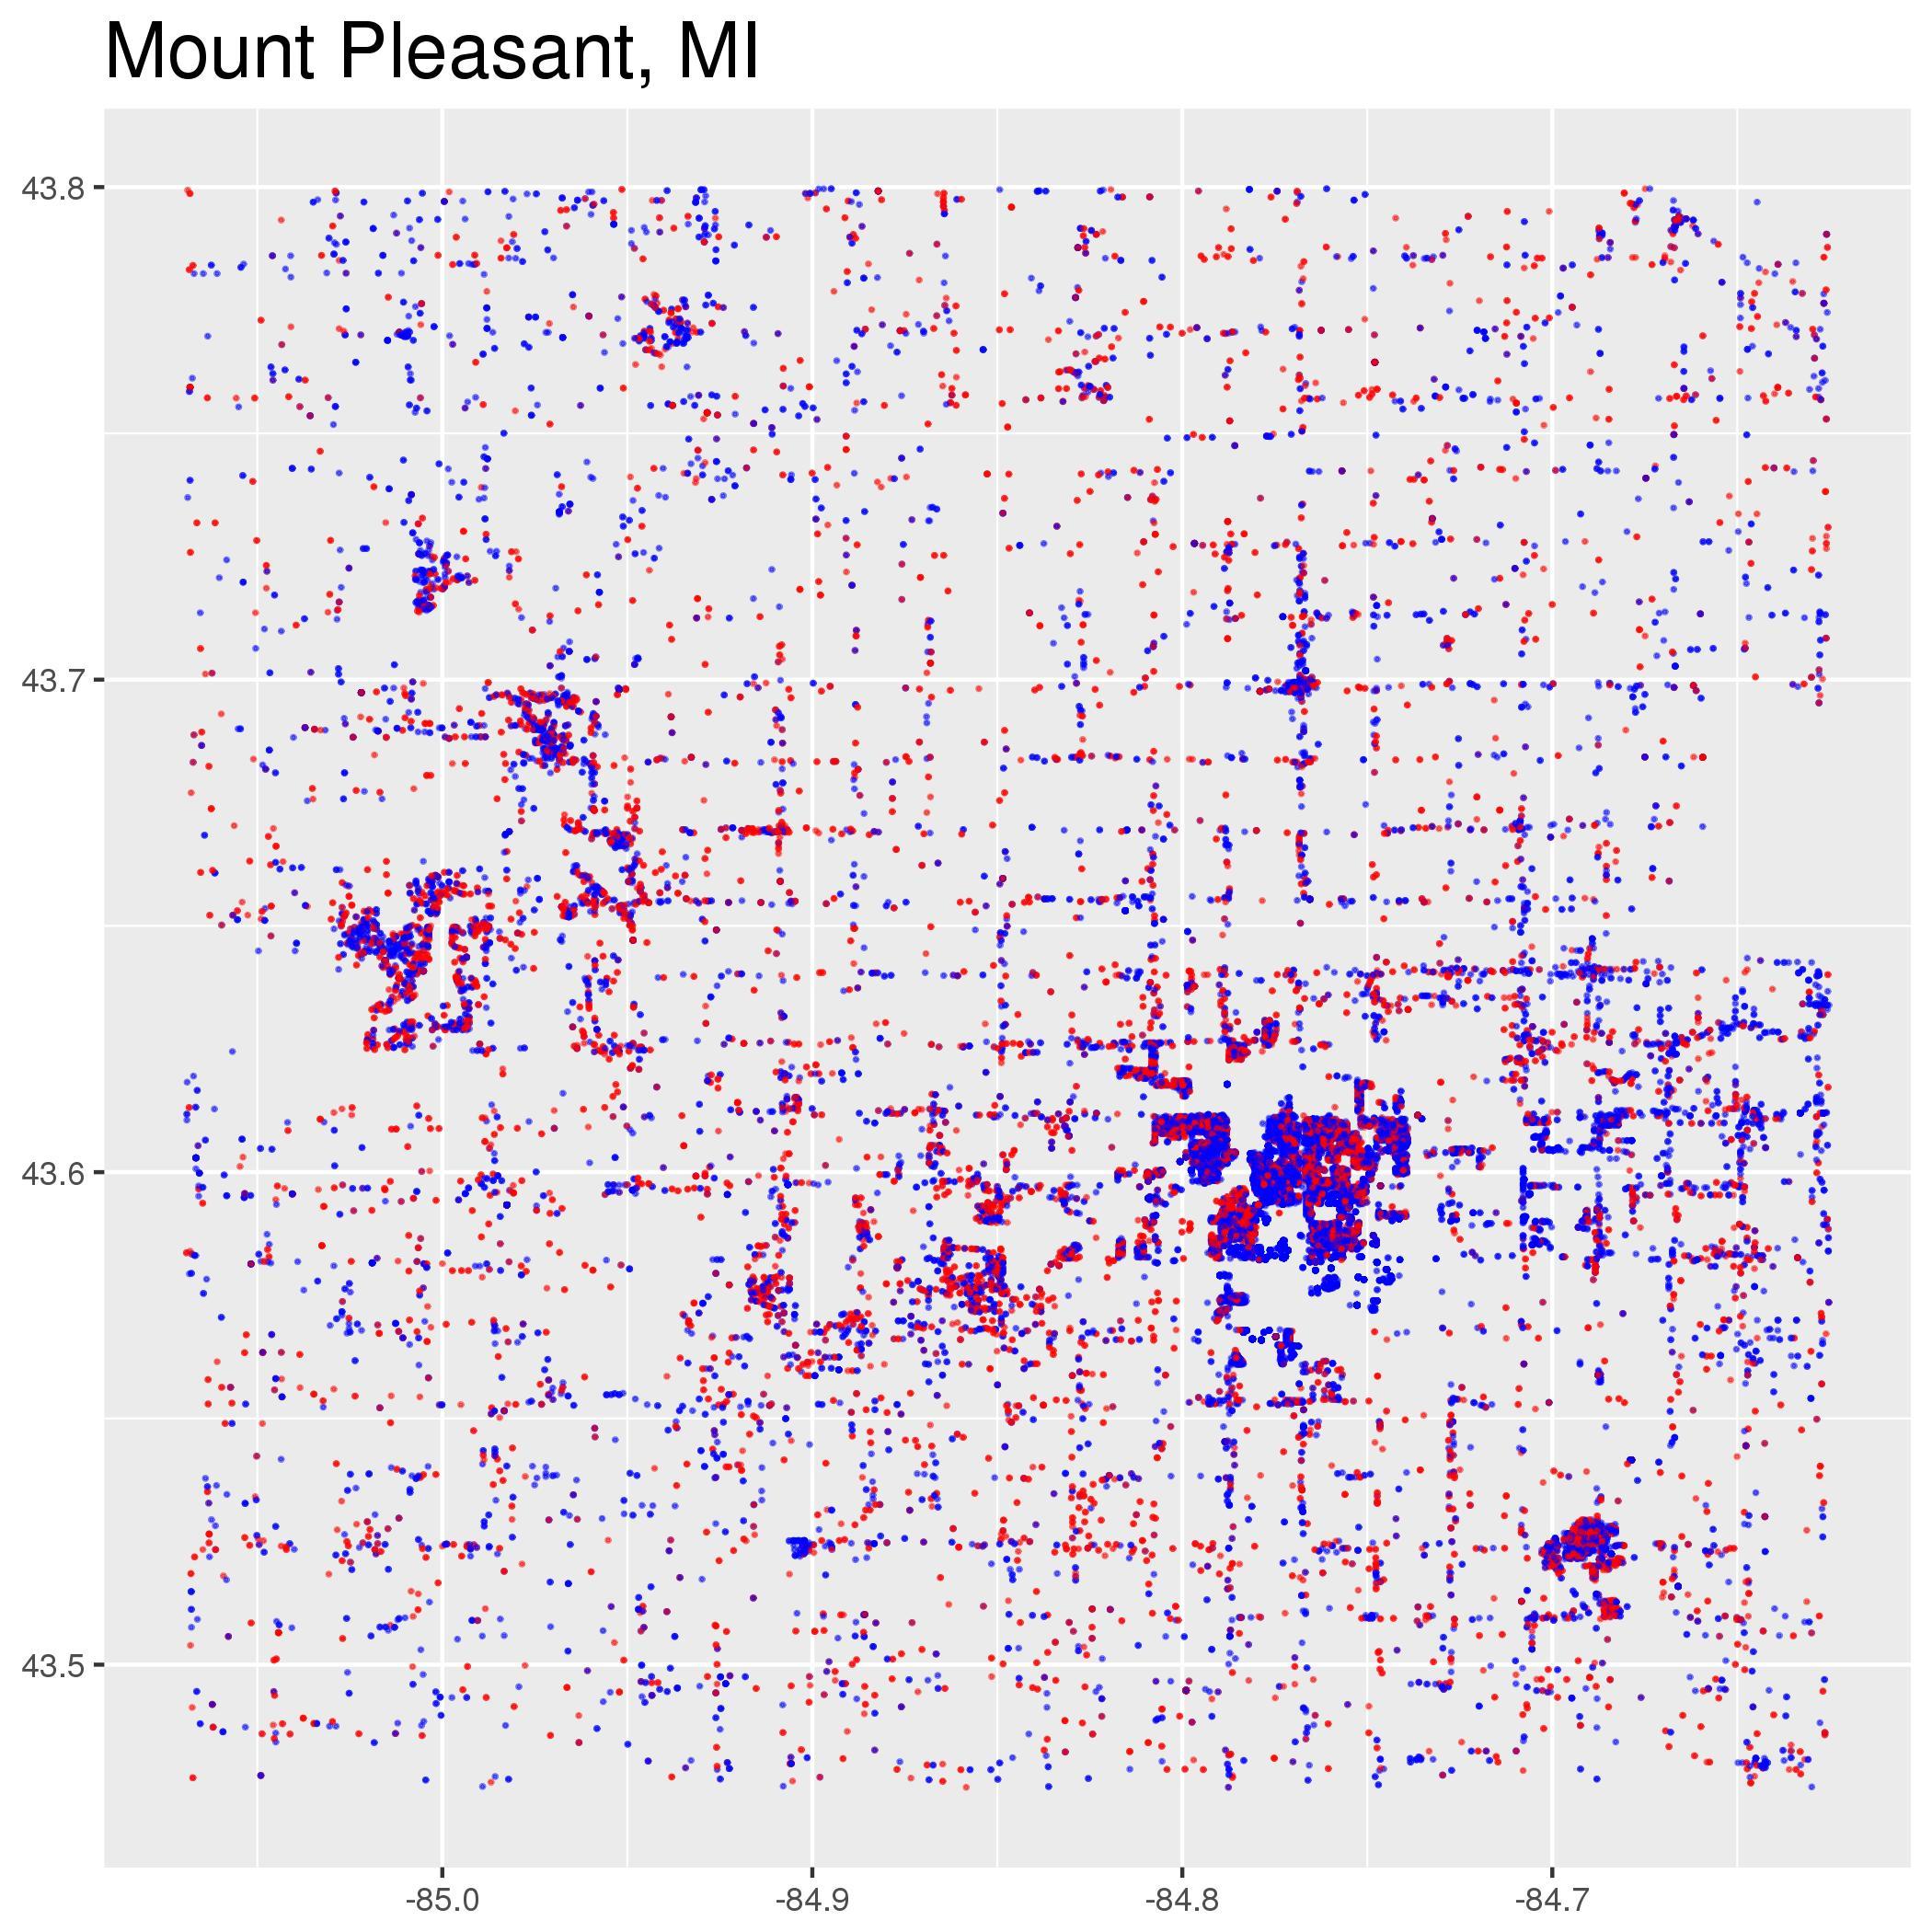 MountPleasantMI.jpeg